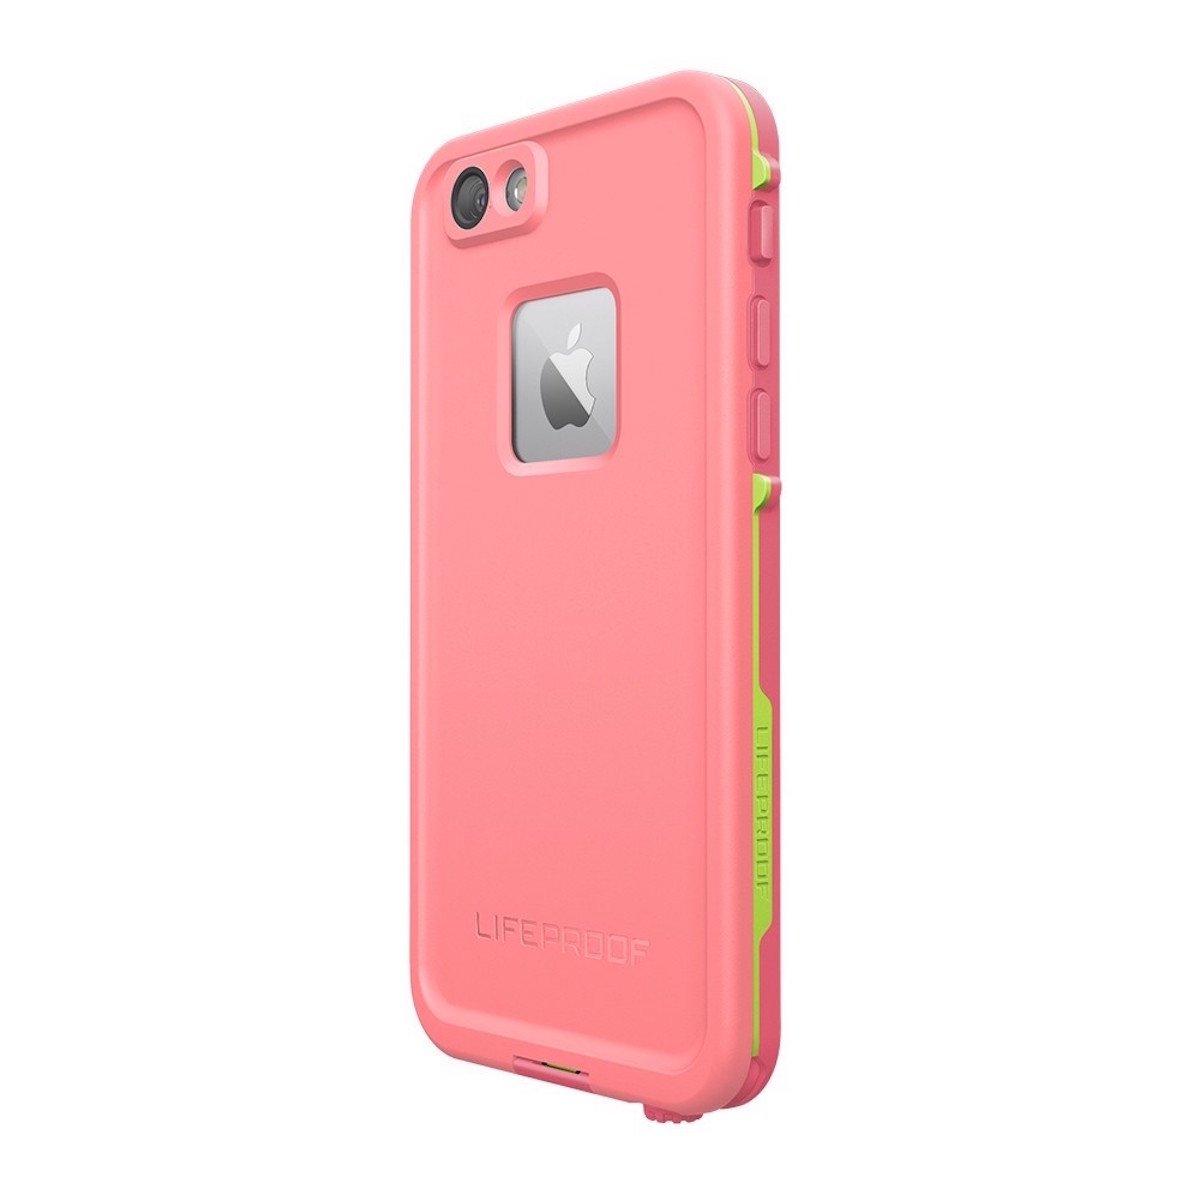 Funda lifeproof fre iphone 6s 77 52567 rosa sears com mx me entiende - Fundas lifeproof ...